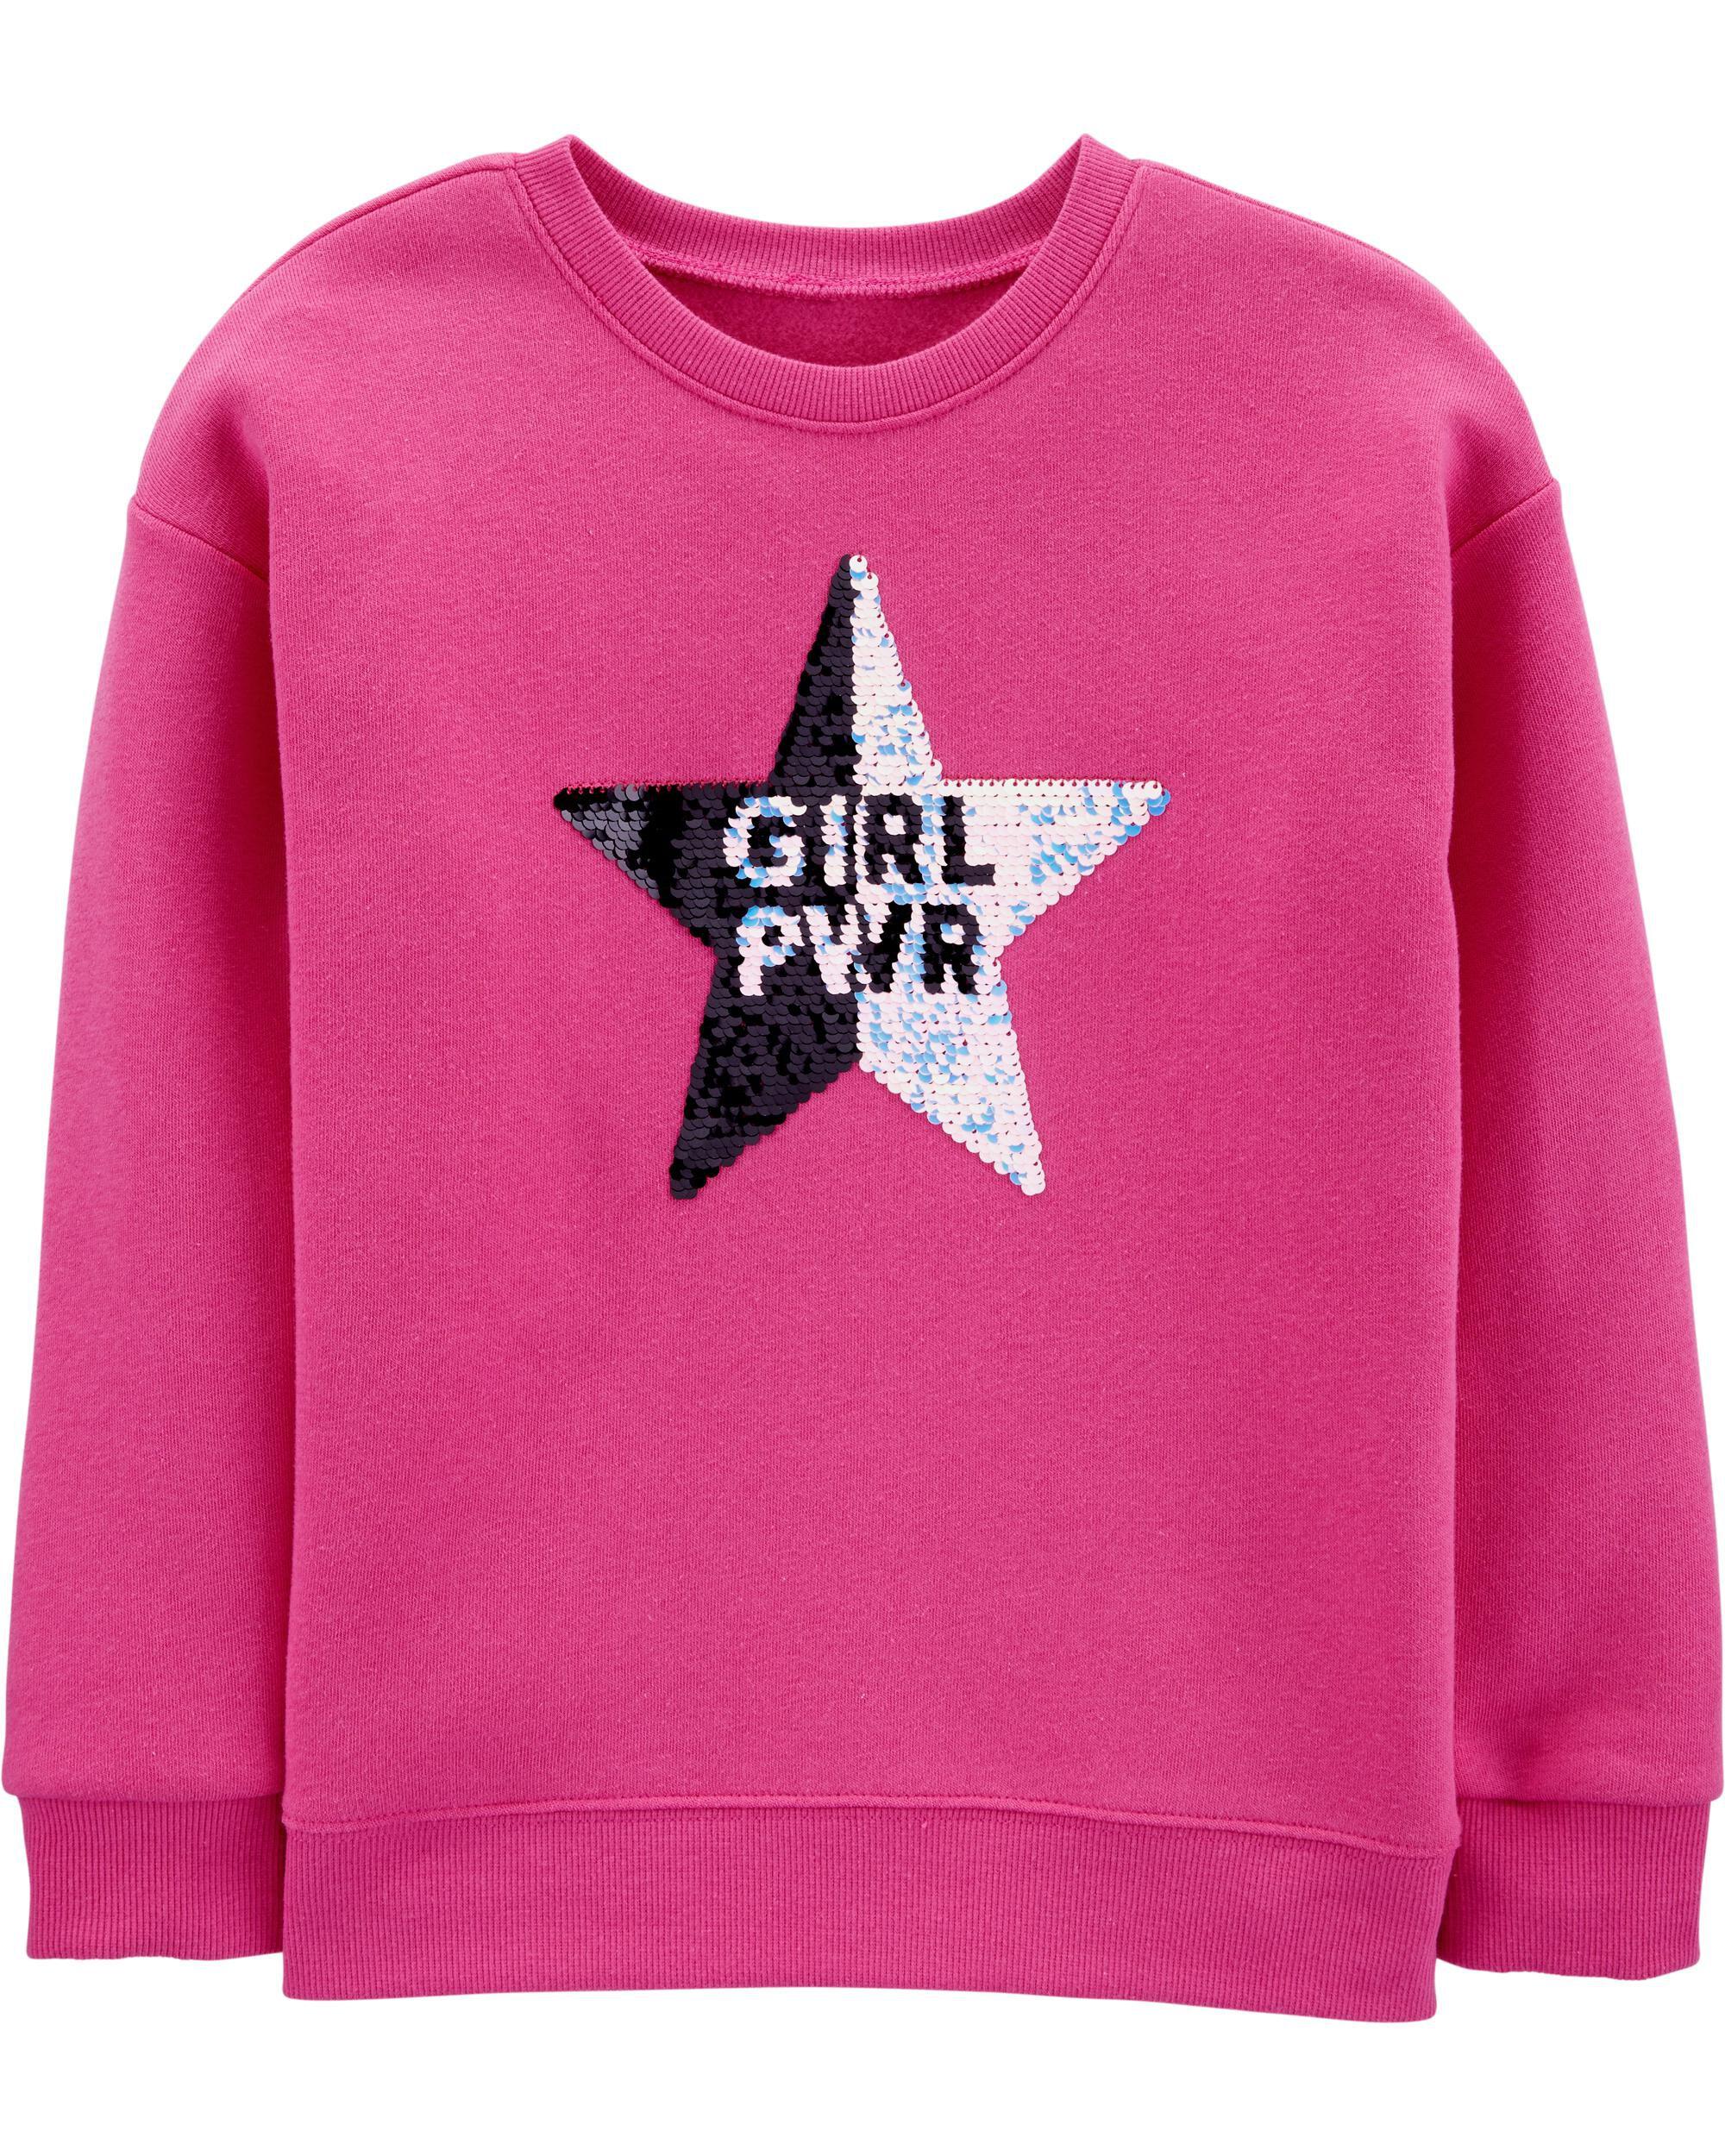 *CLEARANCE* Flip Sequin Star Sweatshirt